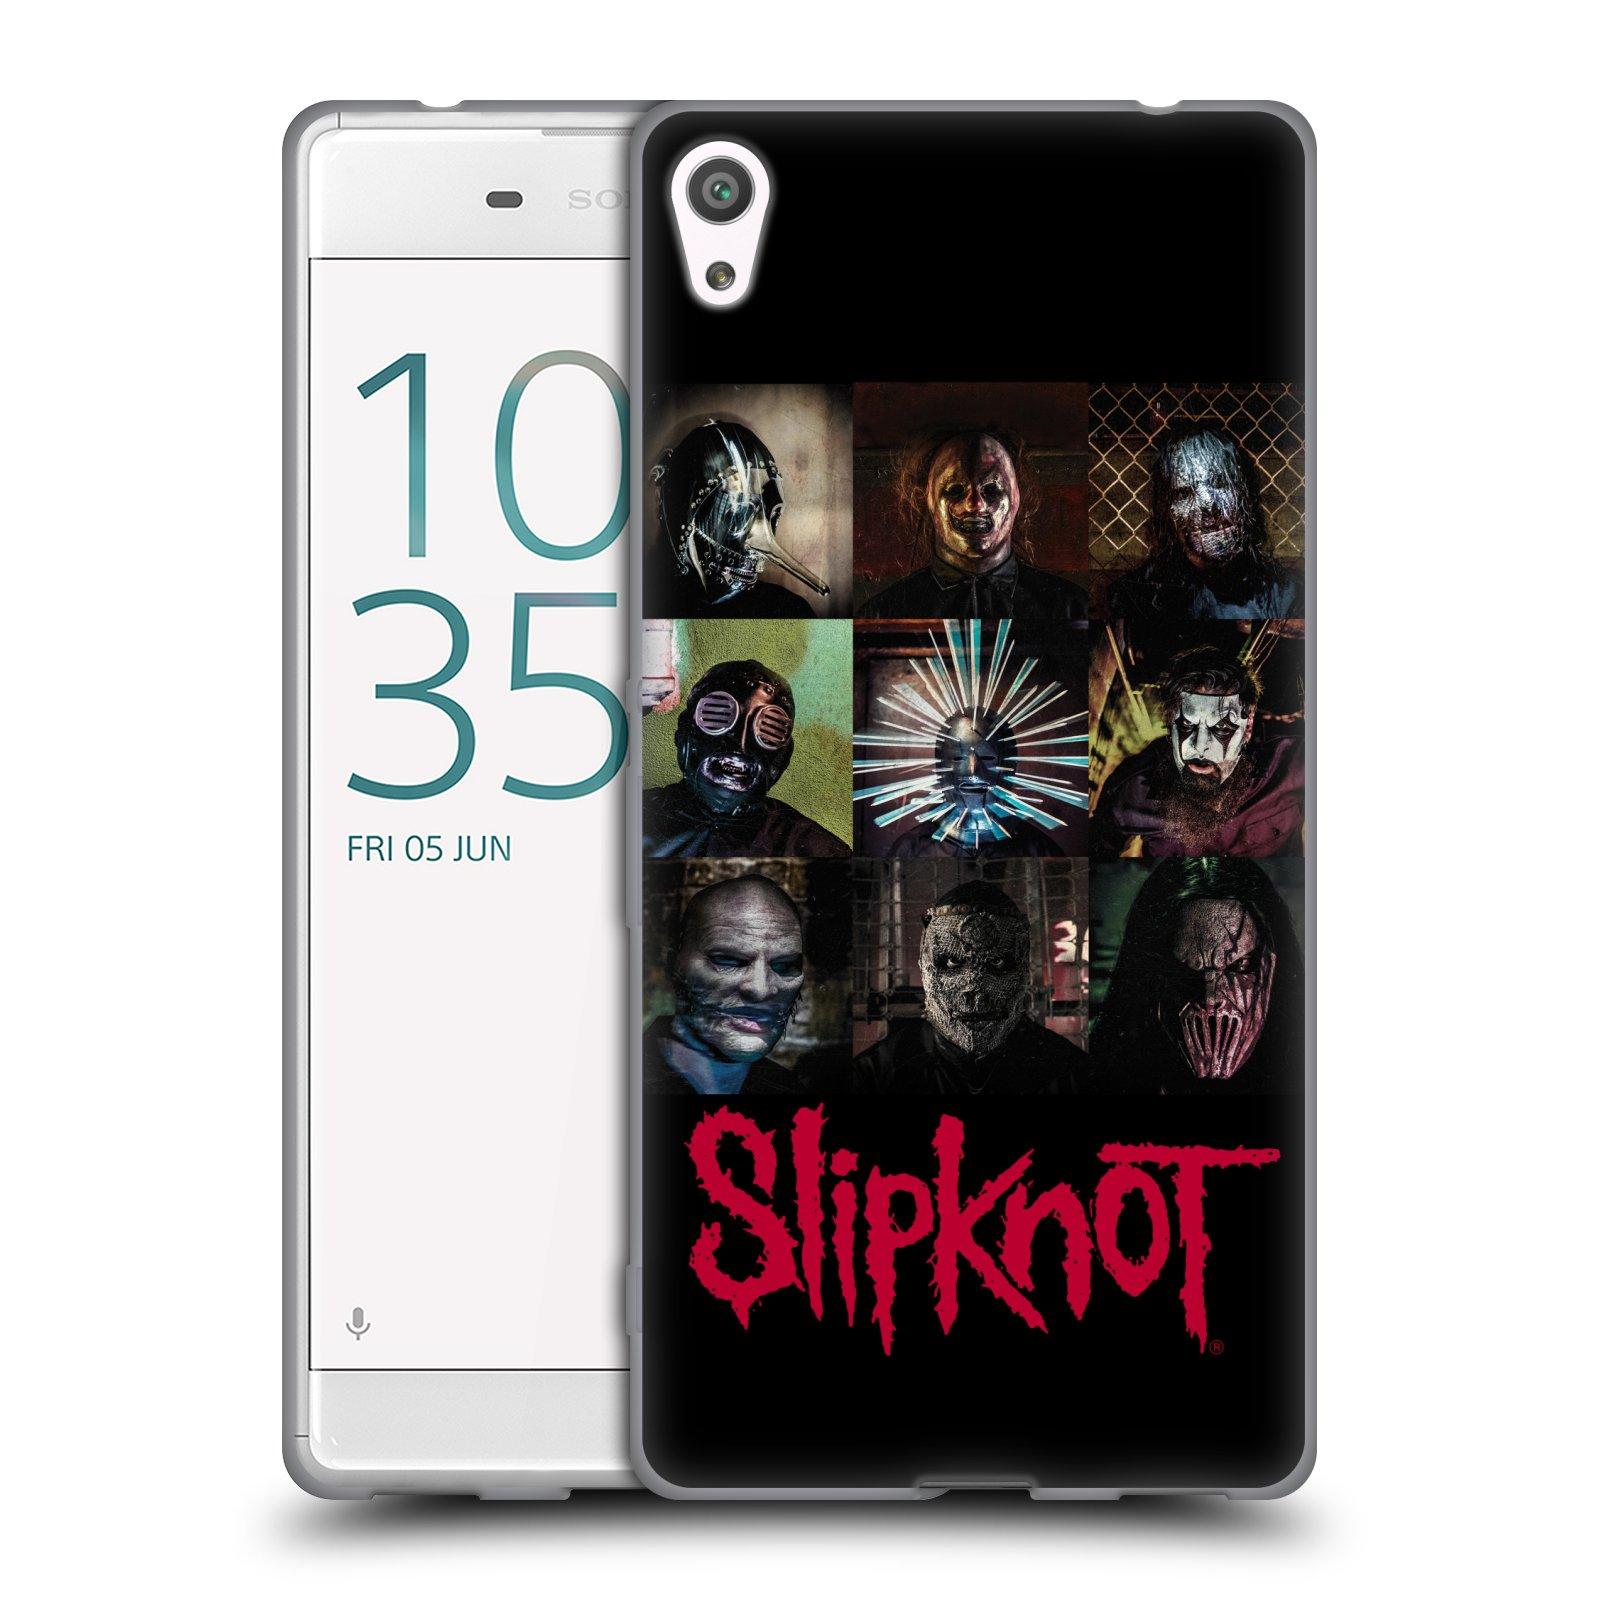 HEAD CASE silikonový obal na mobil Sony Xperia XA ULTRA hudební skupina Slipknot logo velké